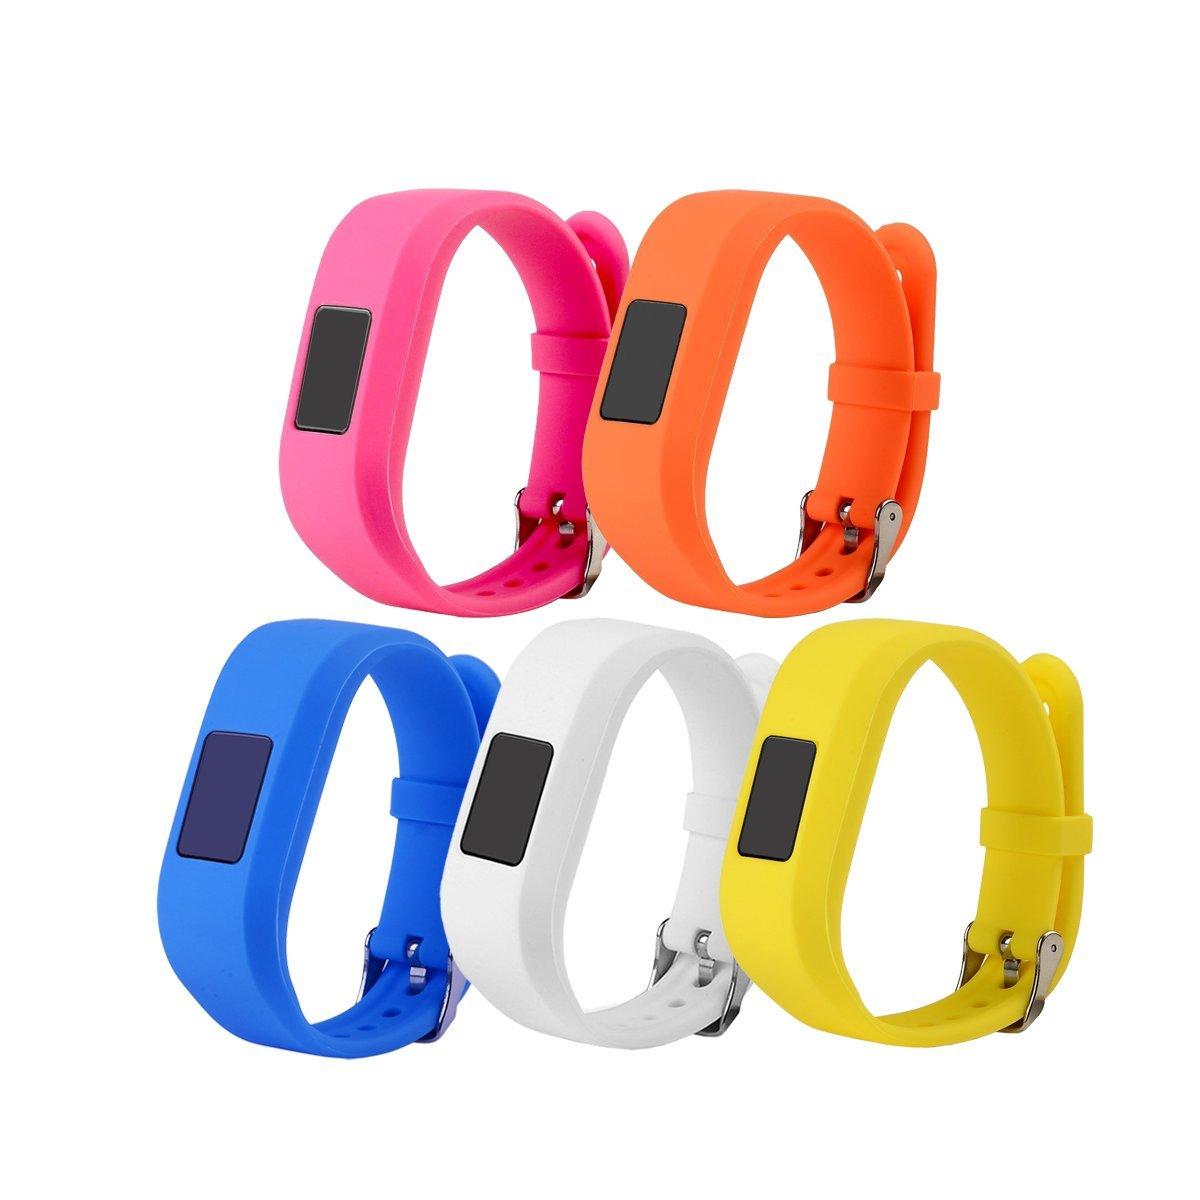 RuenTech Compatible for Garmin vivofit jr and vivofit jr 2 Replacement Band (Kid's Bands) Colorful Adjustable Wristbands with Secure Watch-Style Clasp Strap for Vivofit JR (Girl's colors) by RuenTech